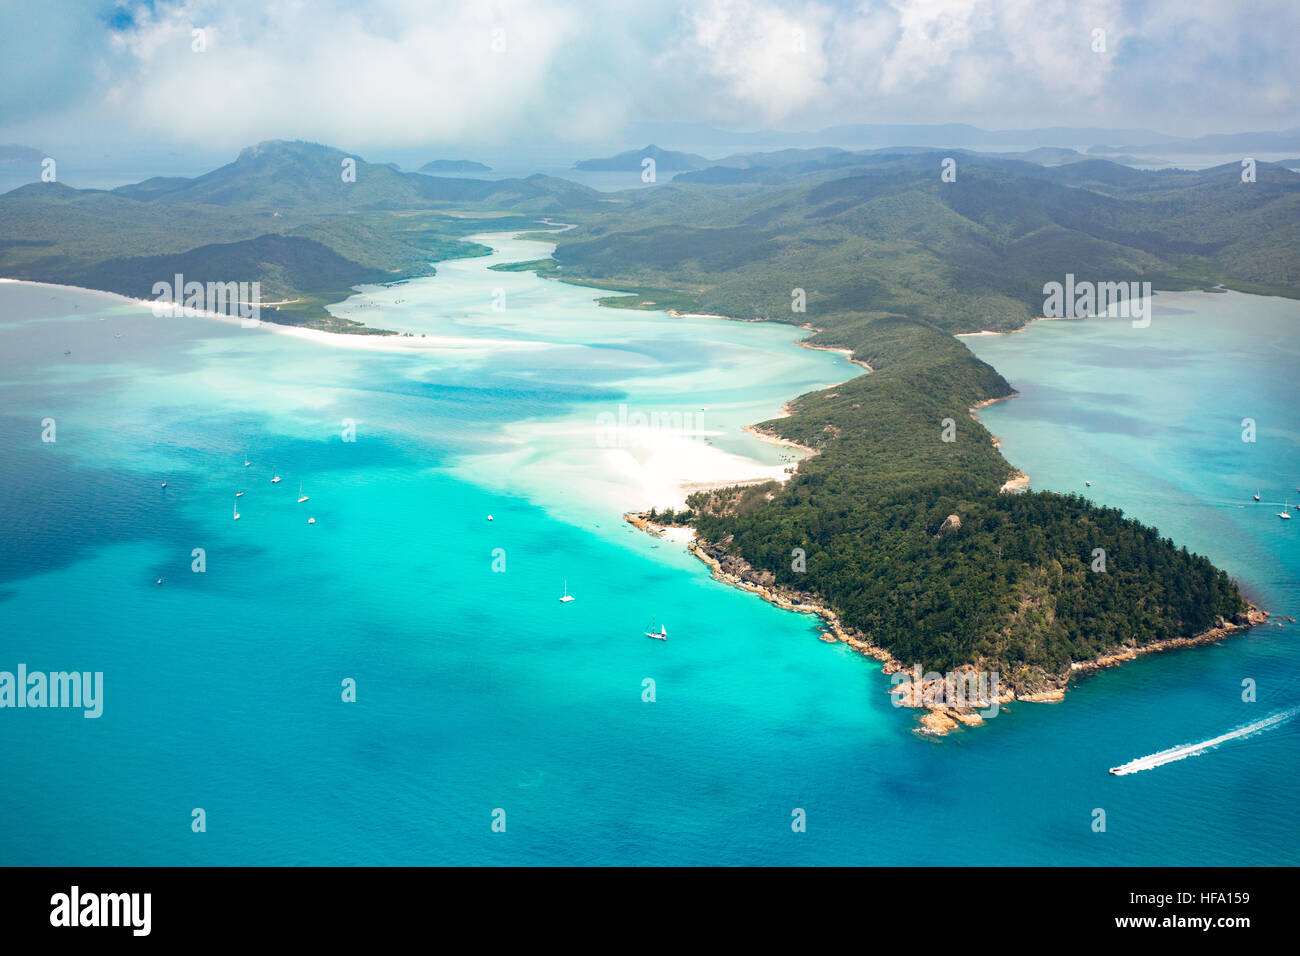 Whitsunday Islands, Whitehaven Beach, Queensland, Australia Immagini Stock